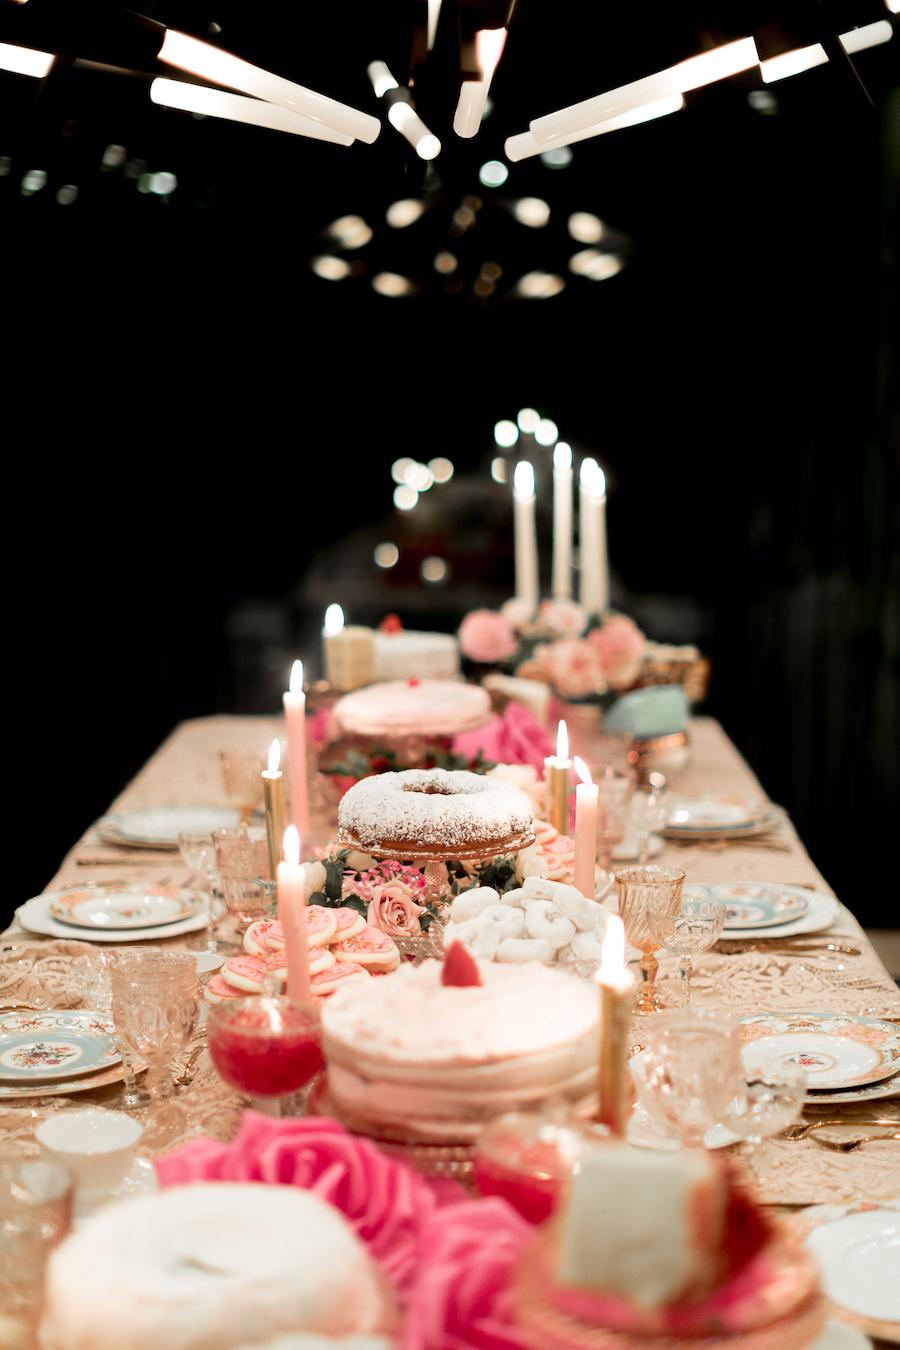 Amirah-kassem-let-them-eat-cake-hylah-white-special-events-rmine-katie-beverley-photography-26.jpg